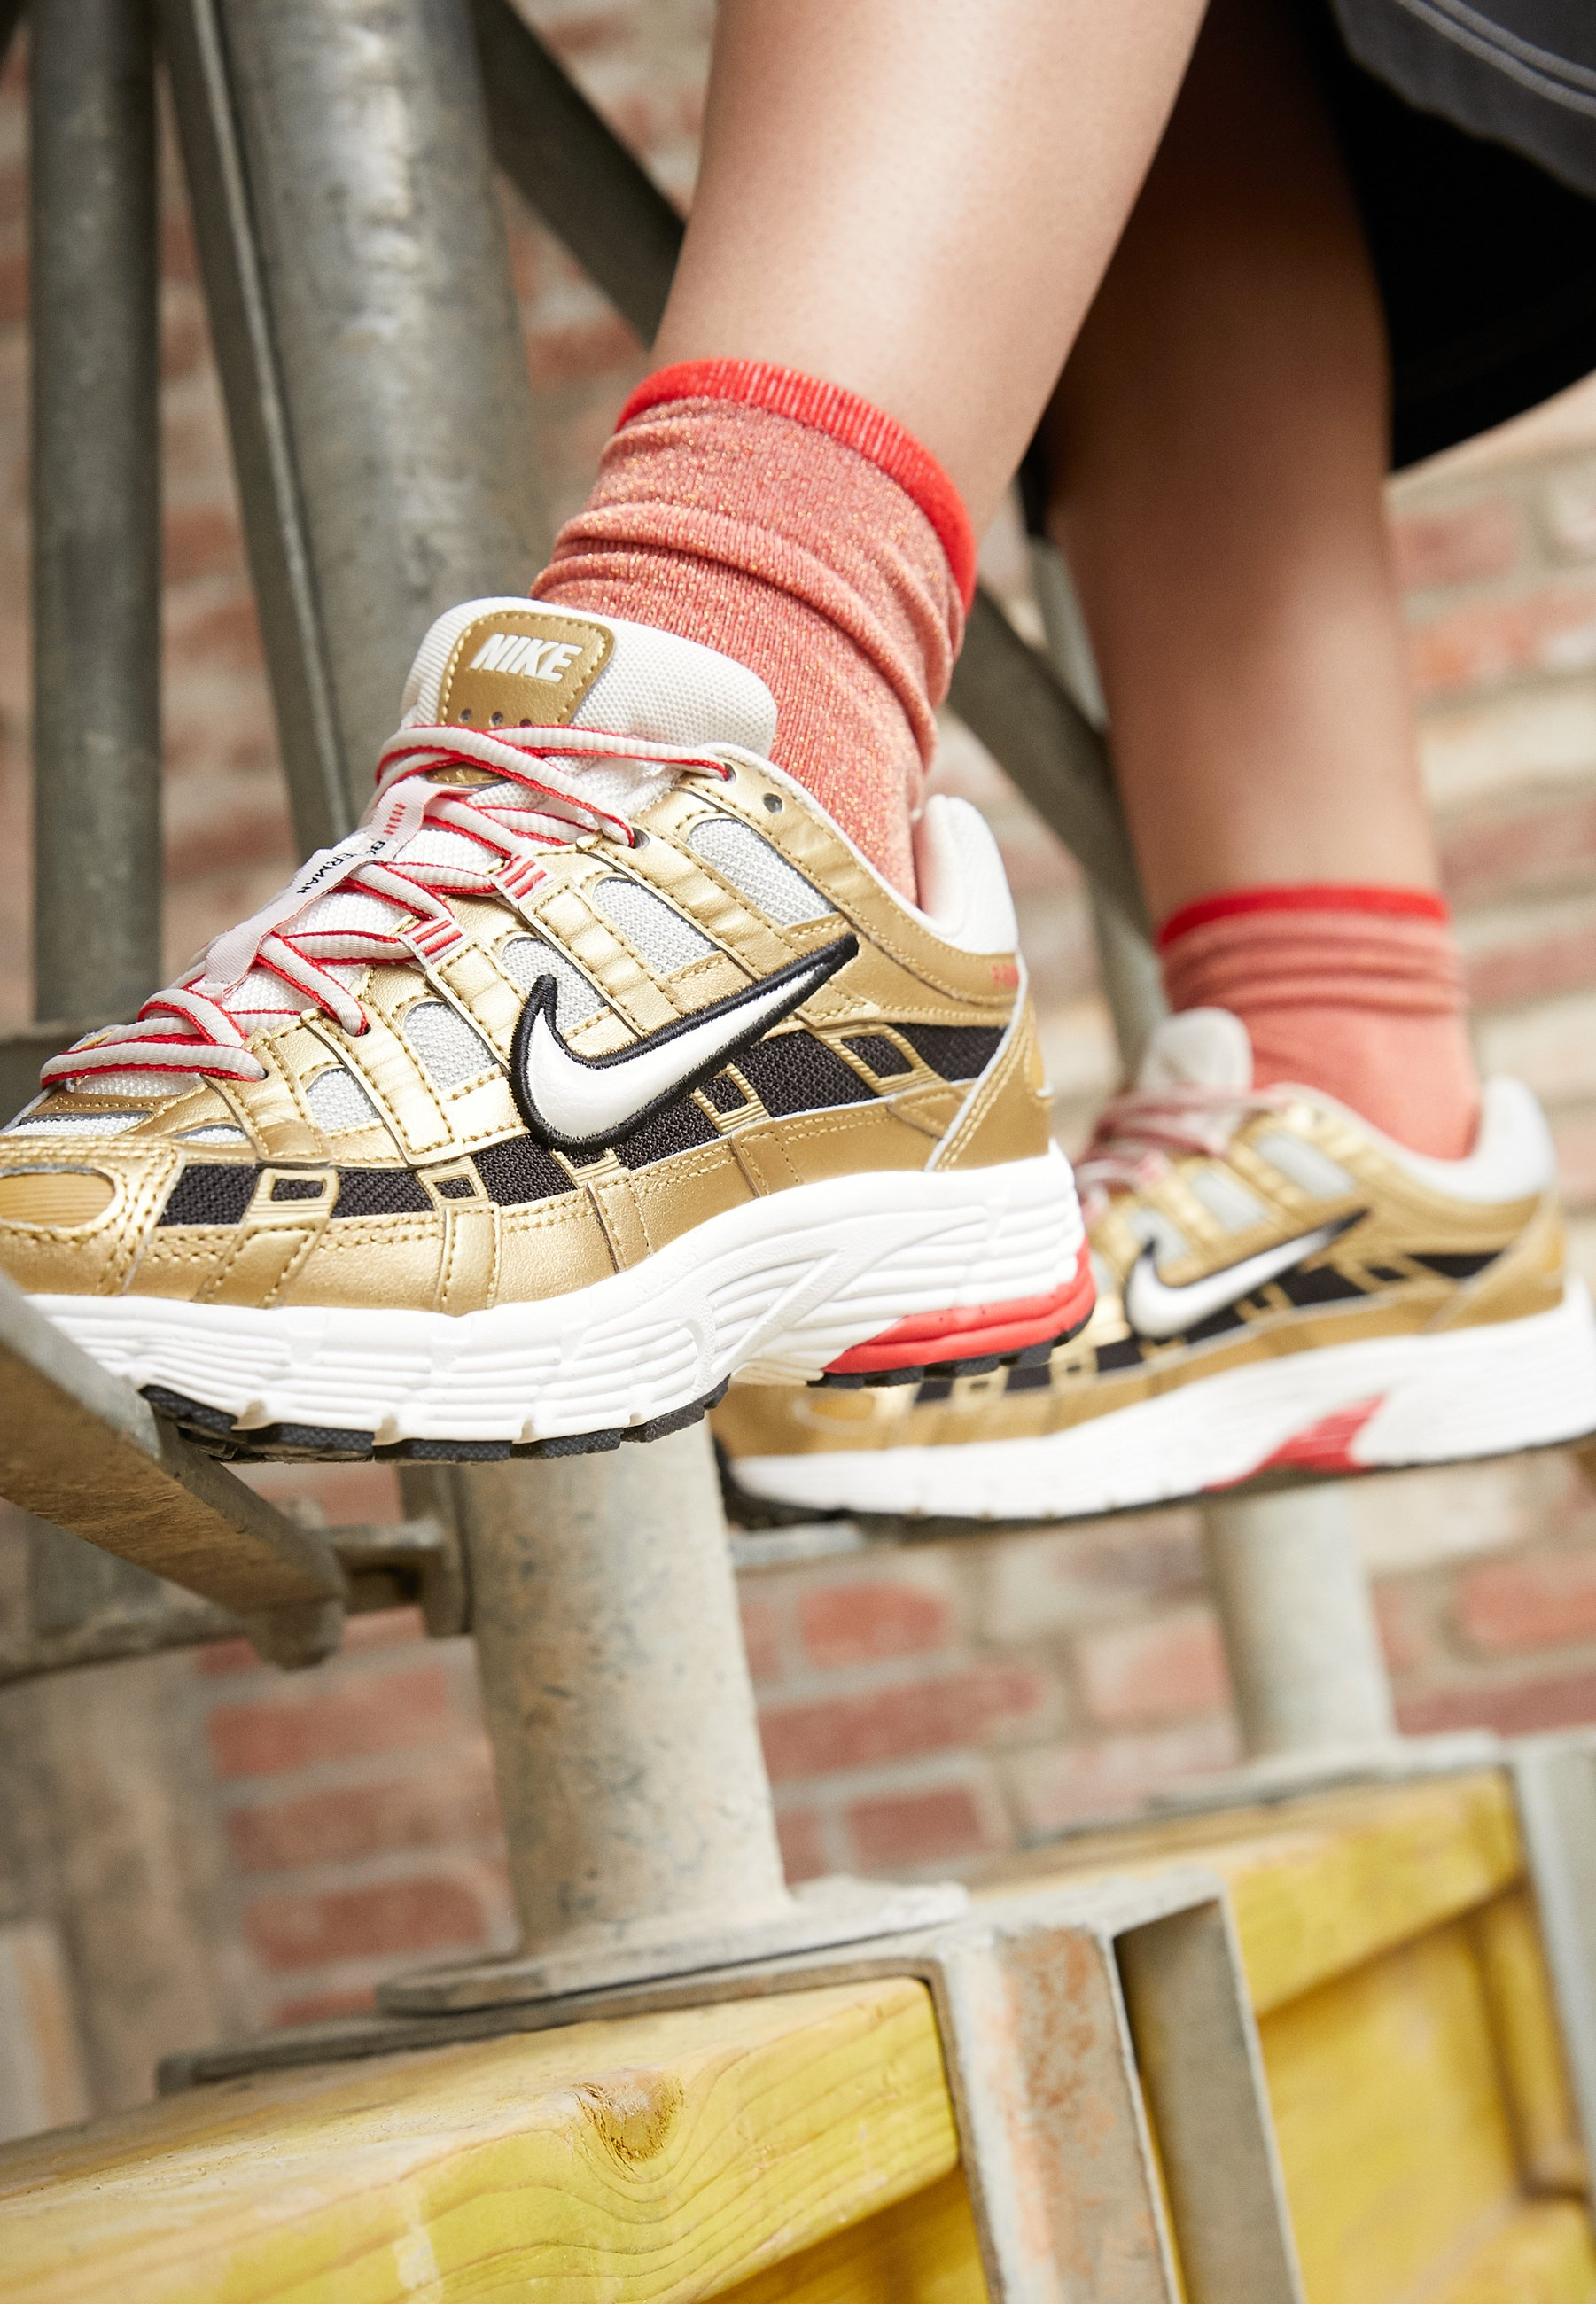 Nike Sportswear P-6000 - Baskets Basses Light Bone/summit White/metallic Gold/university Red/black Fb6eODK